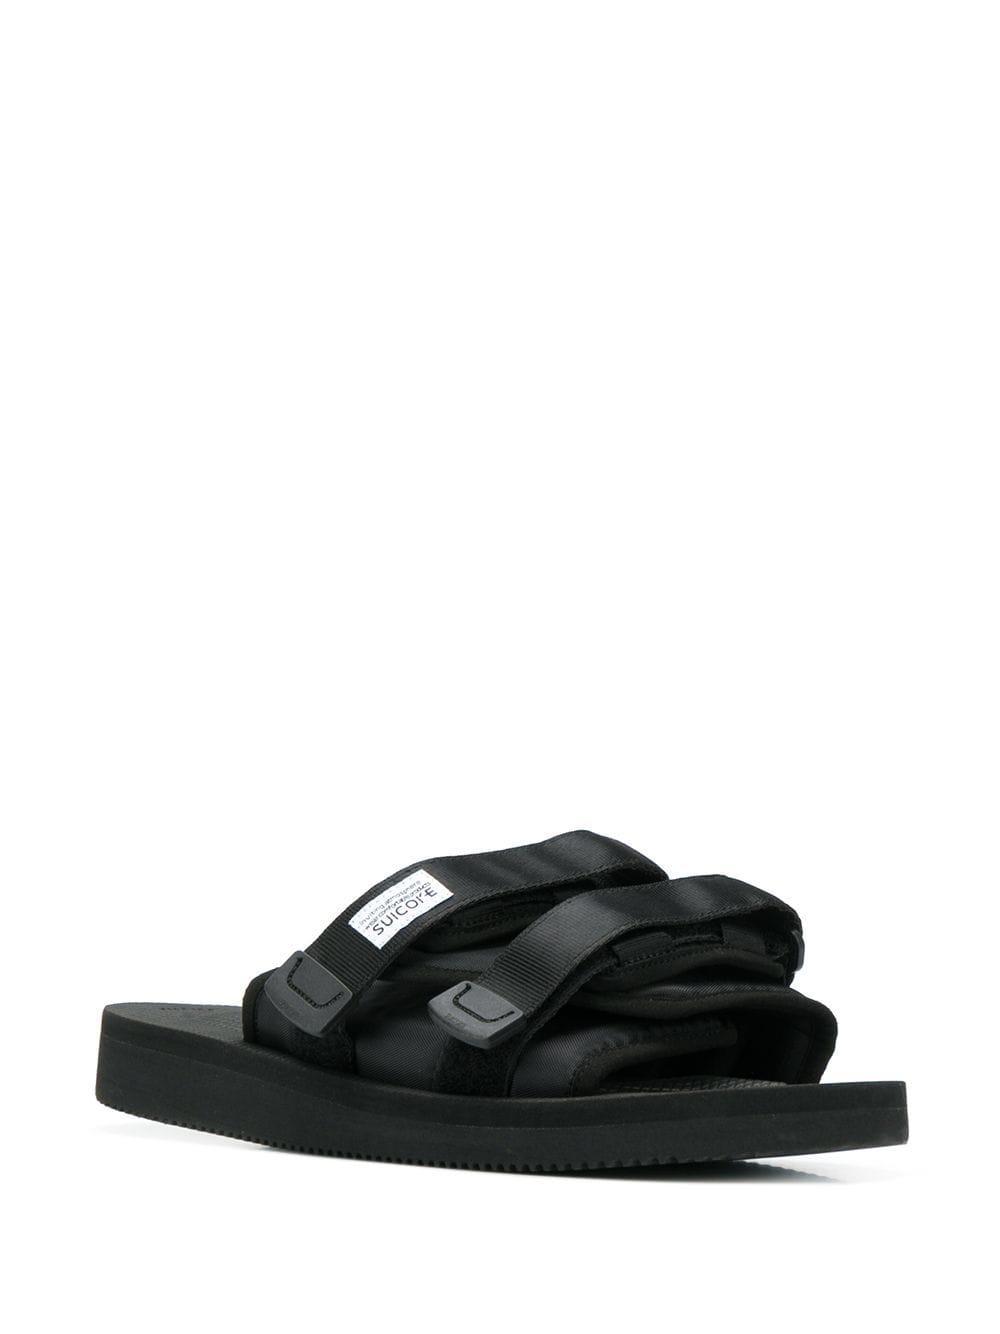 95d49dcfd7c3 Suicoke Black Double Strap Sliders in Black for Men - Lyst